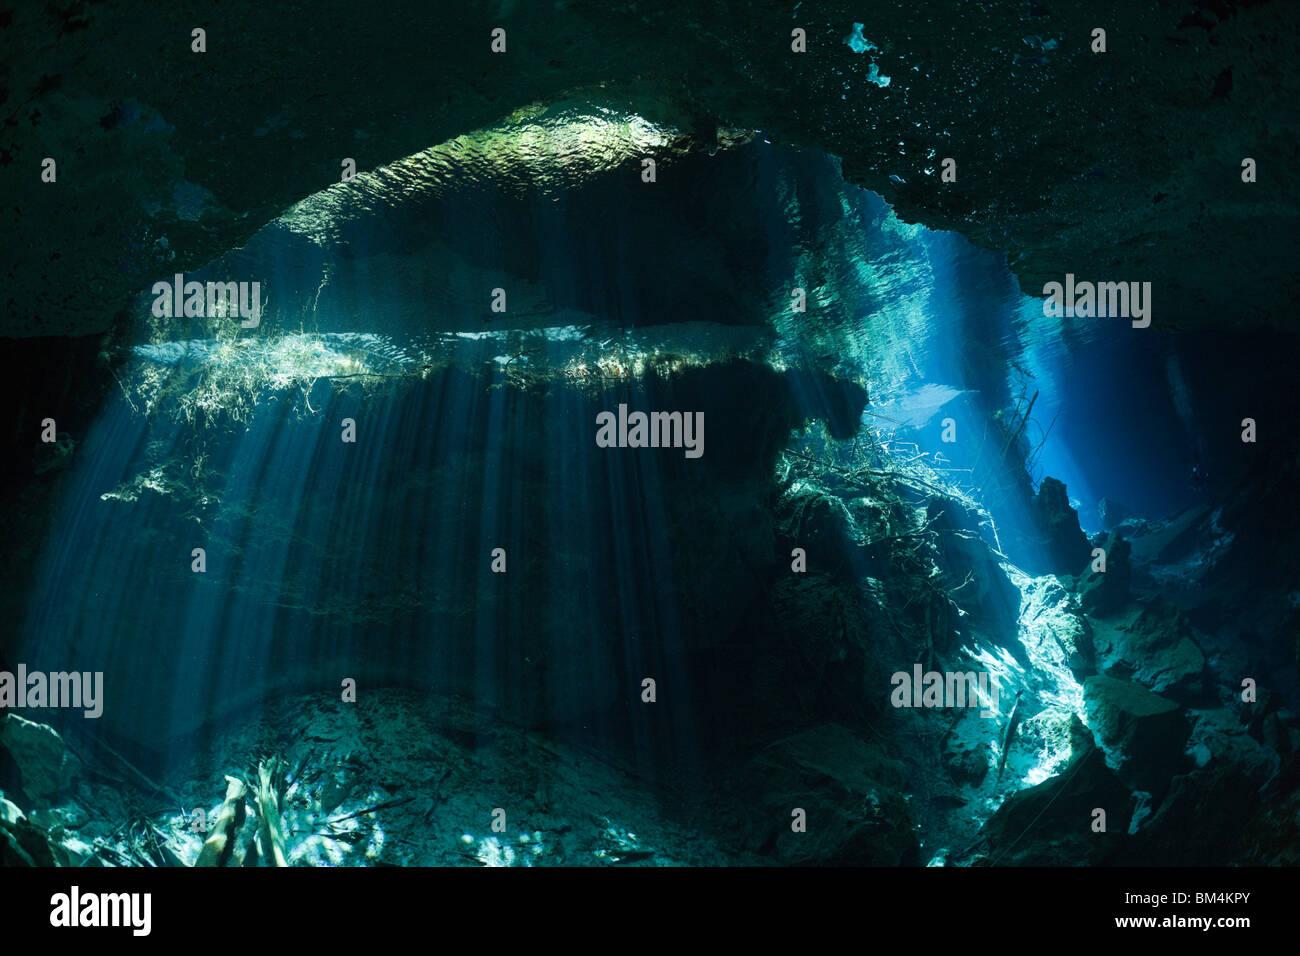 Entrance of Chac Mool Cenote, Playa del Carmen, Yucatan Peninsula, Mexico - Stock Image